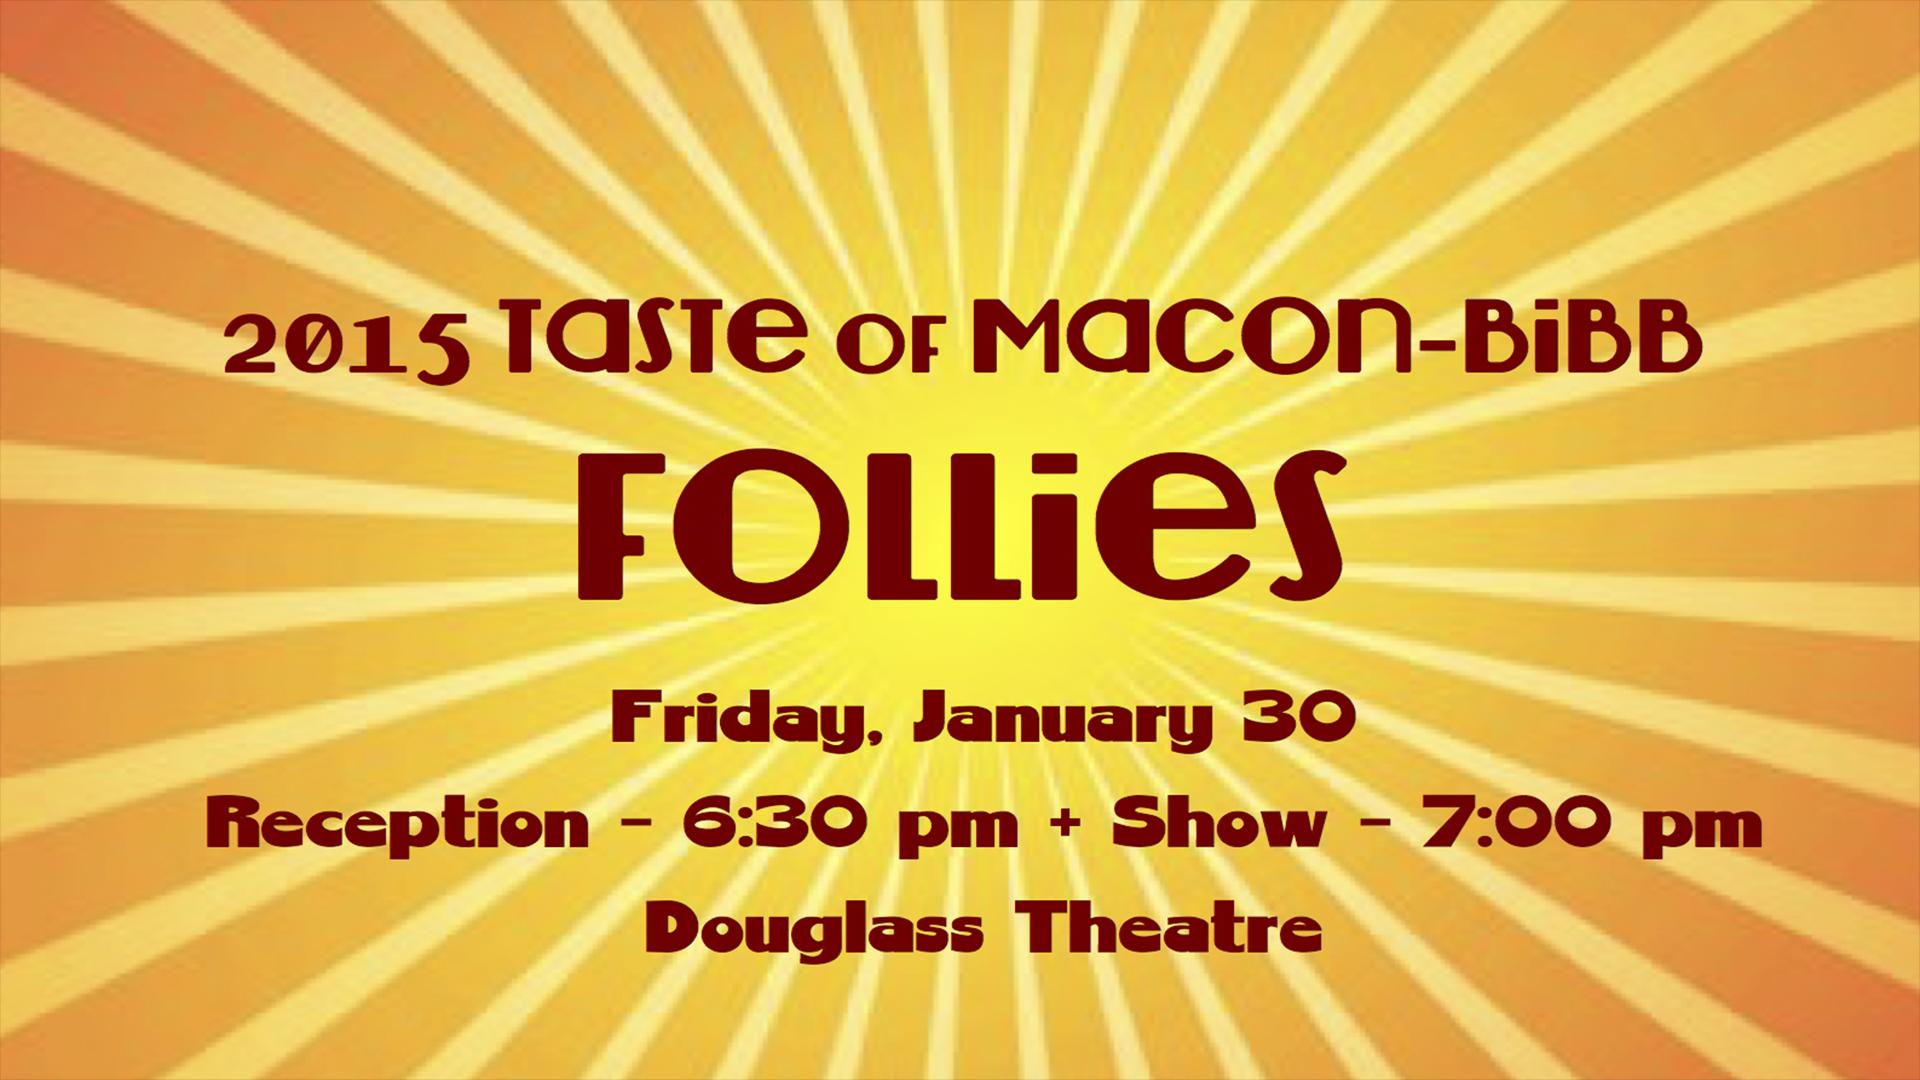 Taste of Macon-Bibb Follies 2015